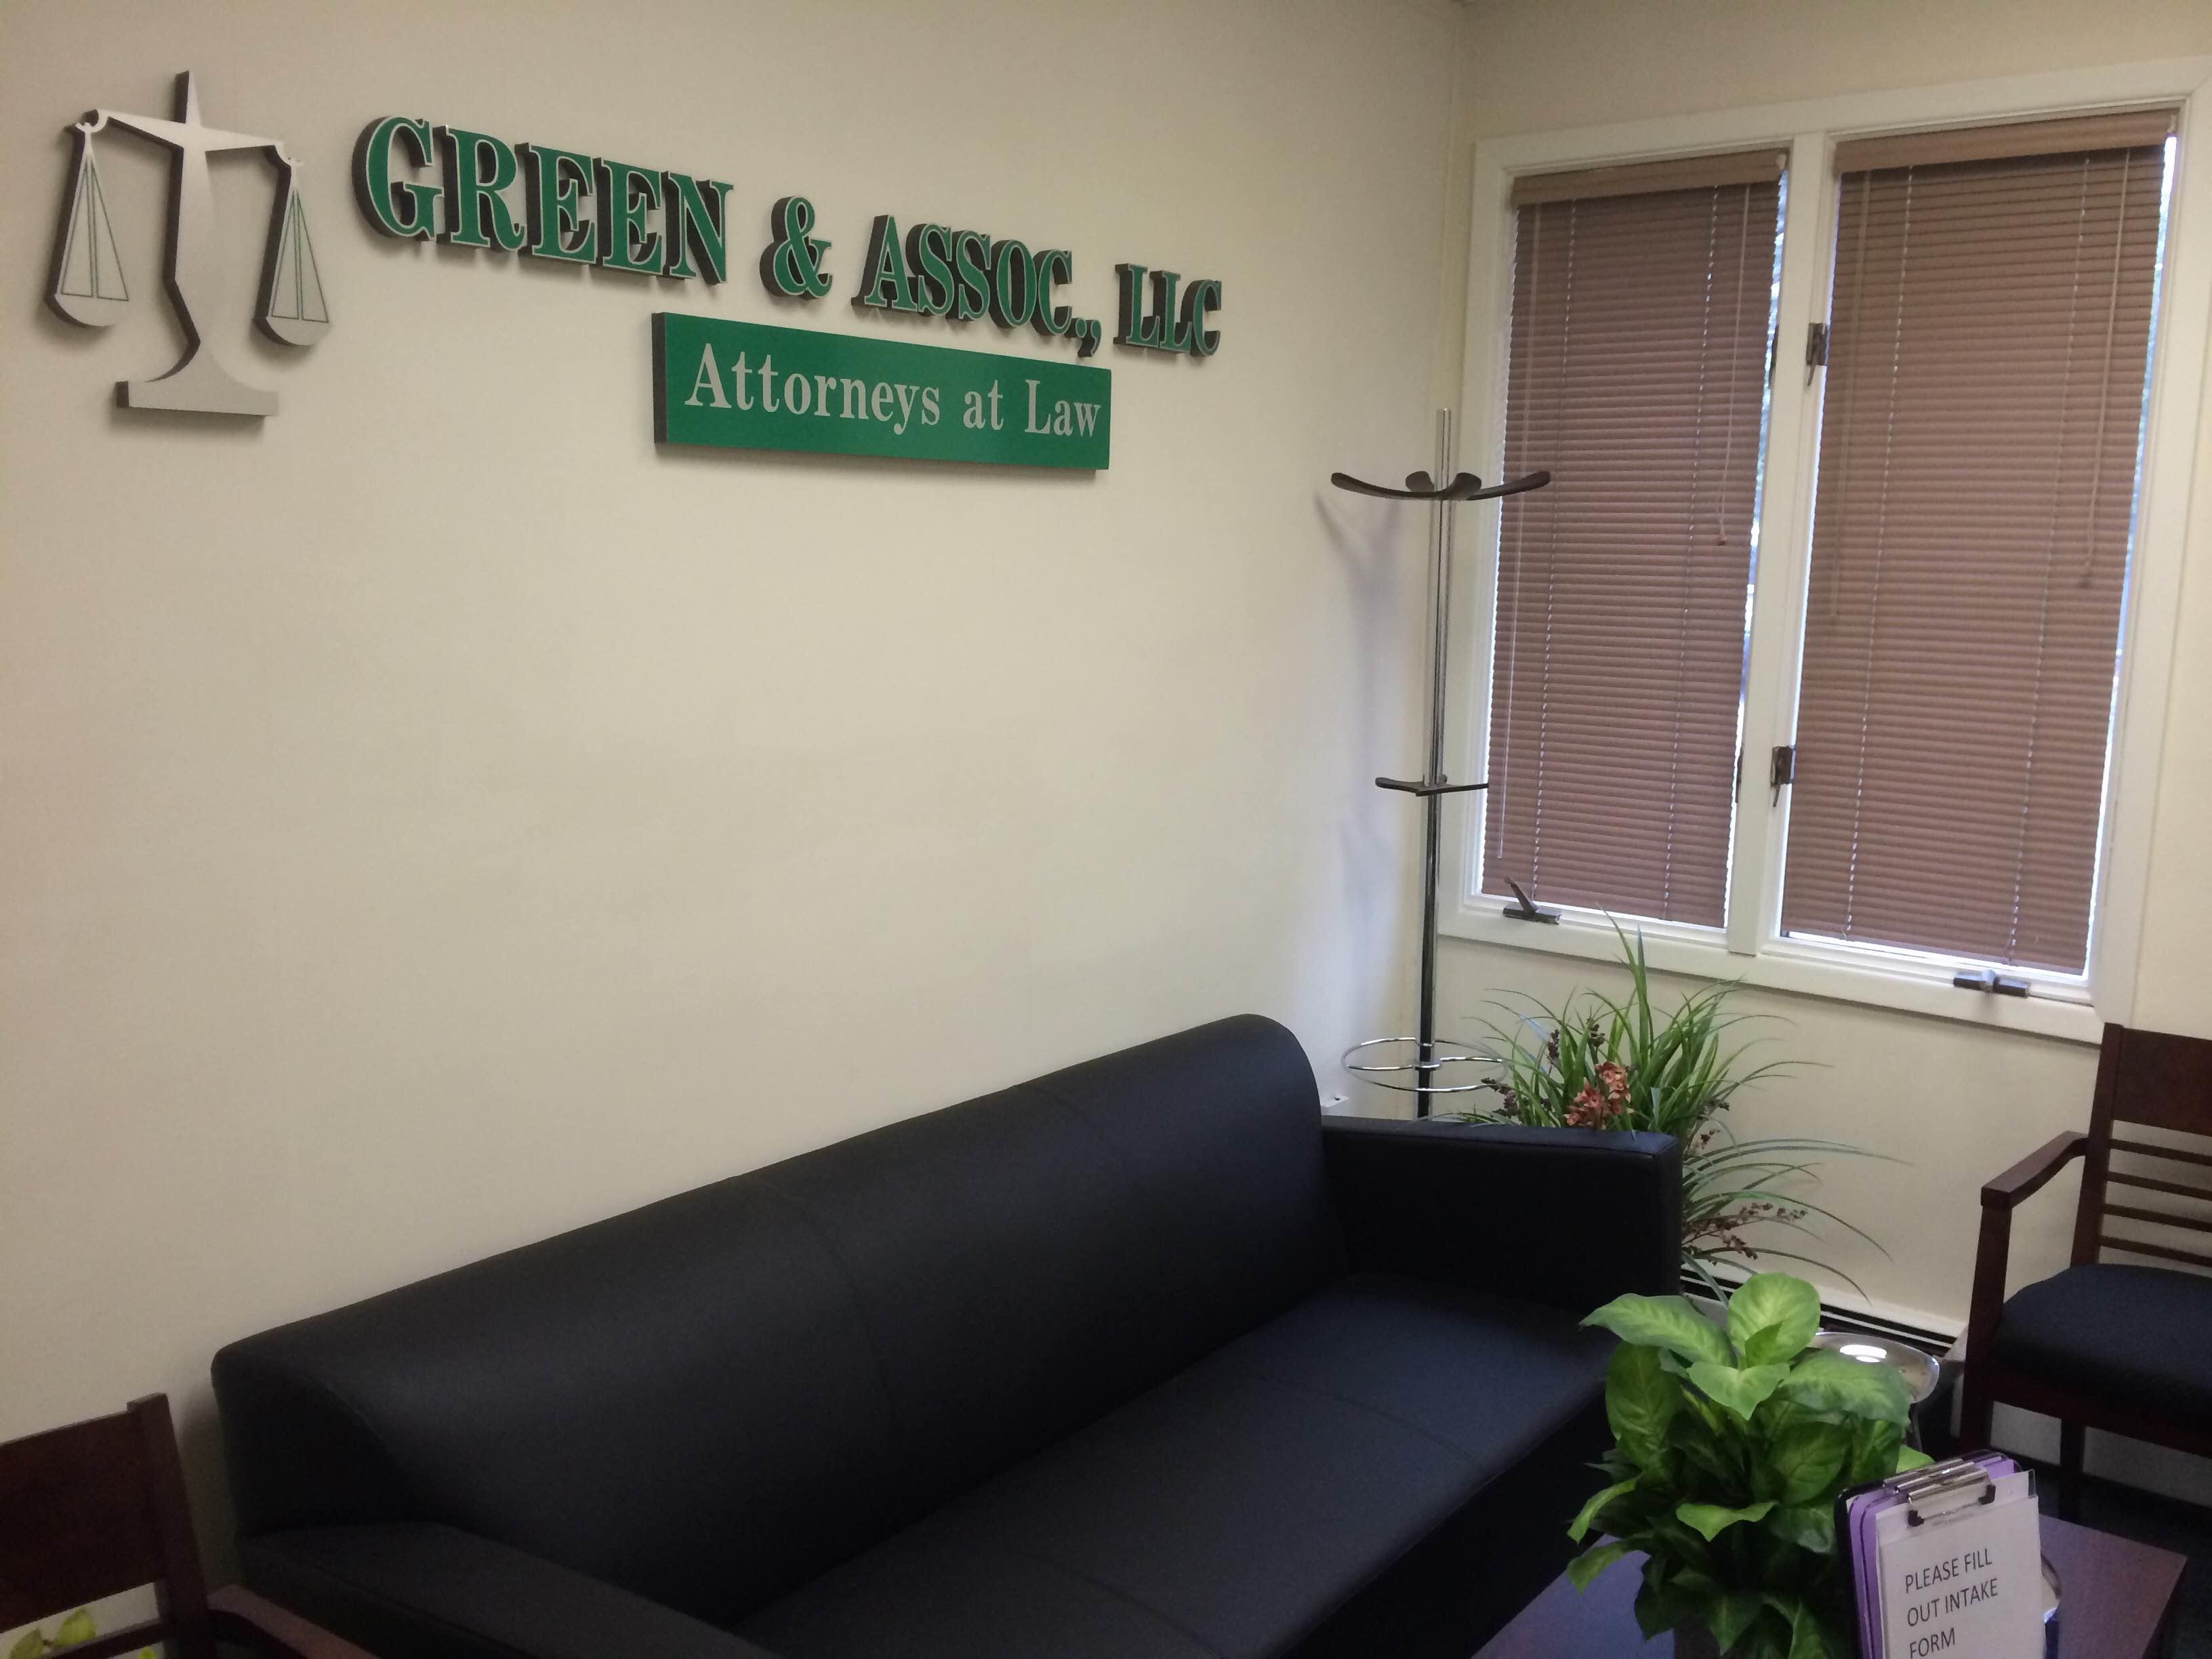 Green & Associates, LLC image 4